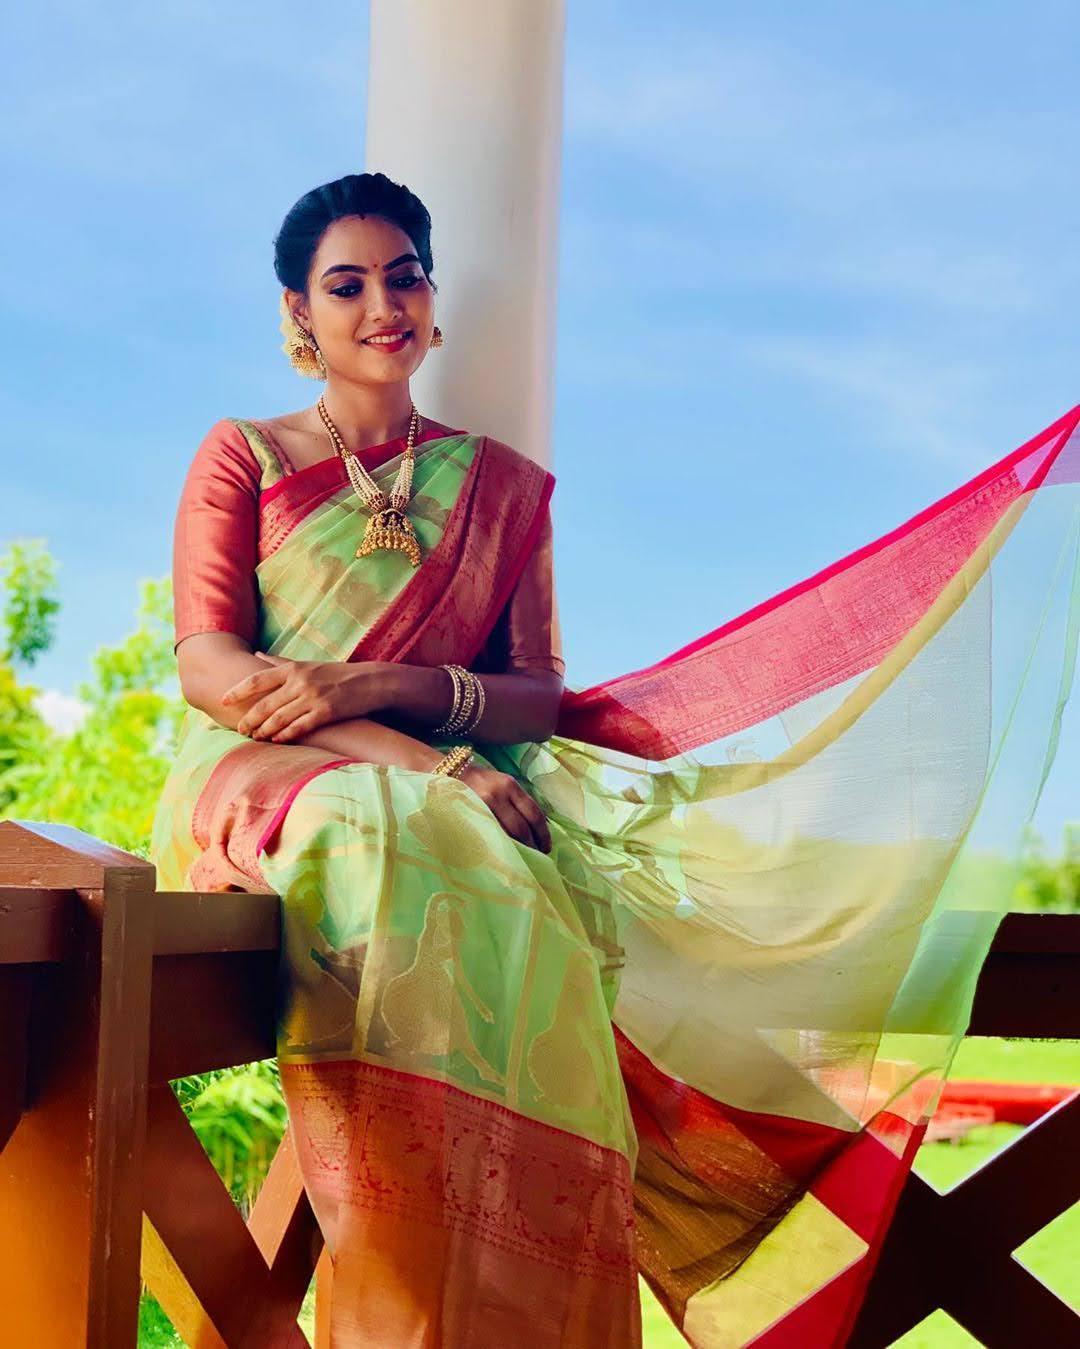 pavithra-janani-64669